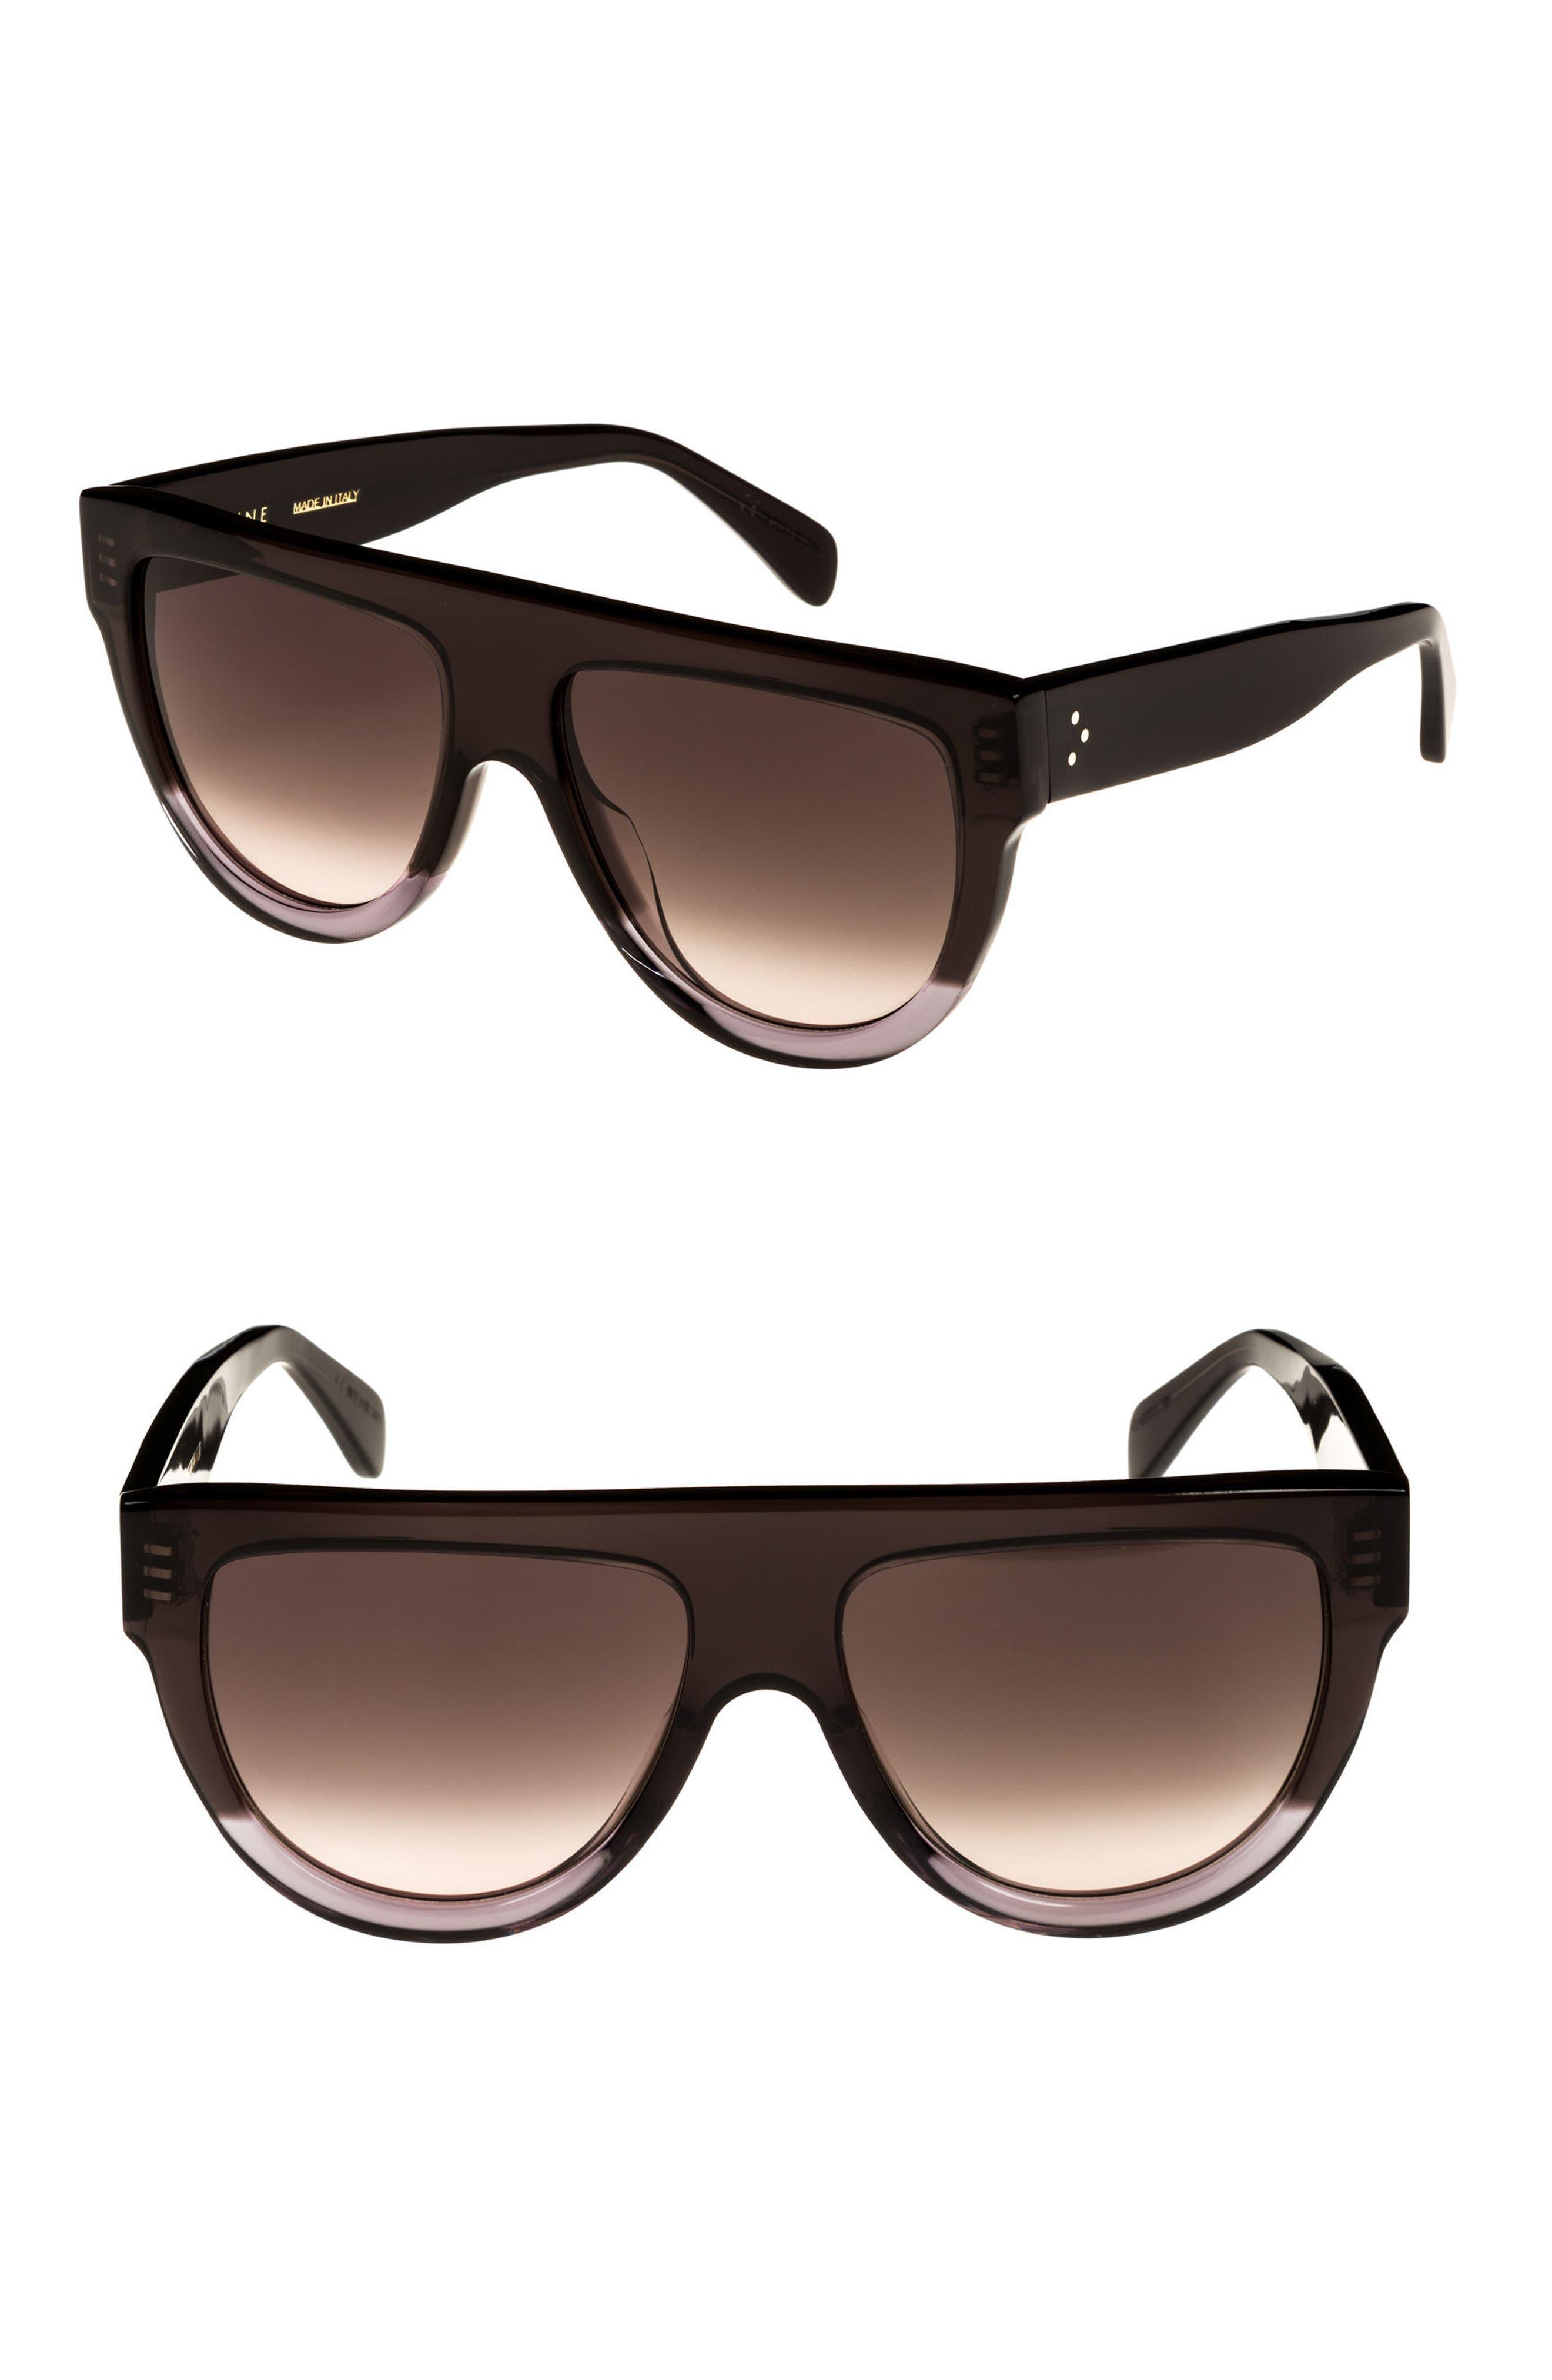 Céline Special Fit 60mm Flat Top Sunglasses